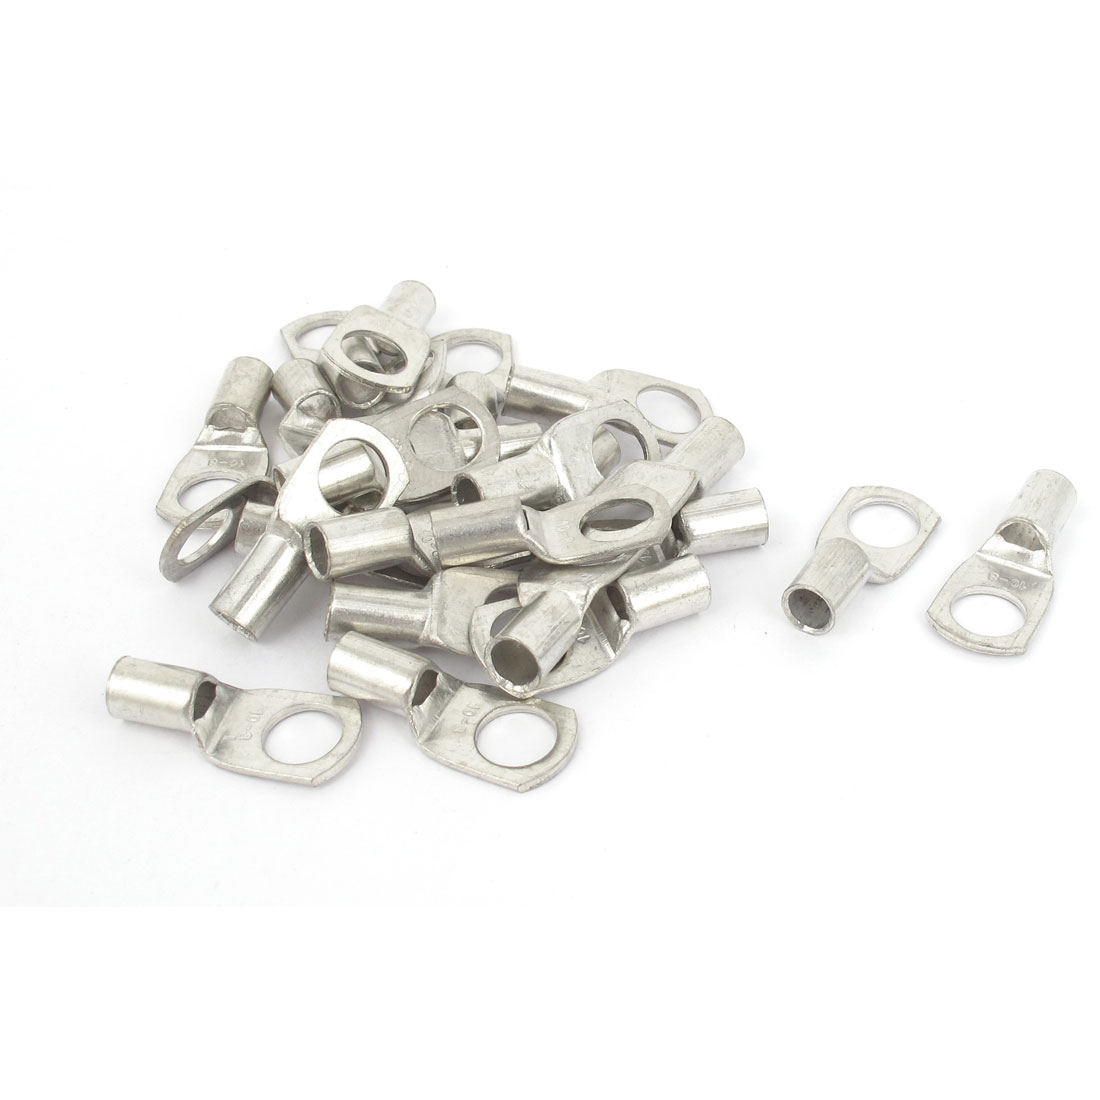 25 Pcs Silver Tone 10-8 8mm Bolt 10mm2 Copper Cable Lug Terminal